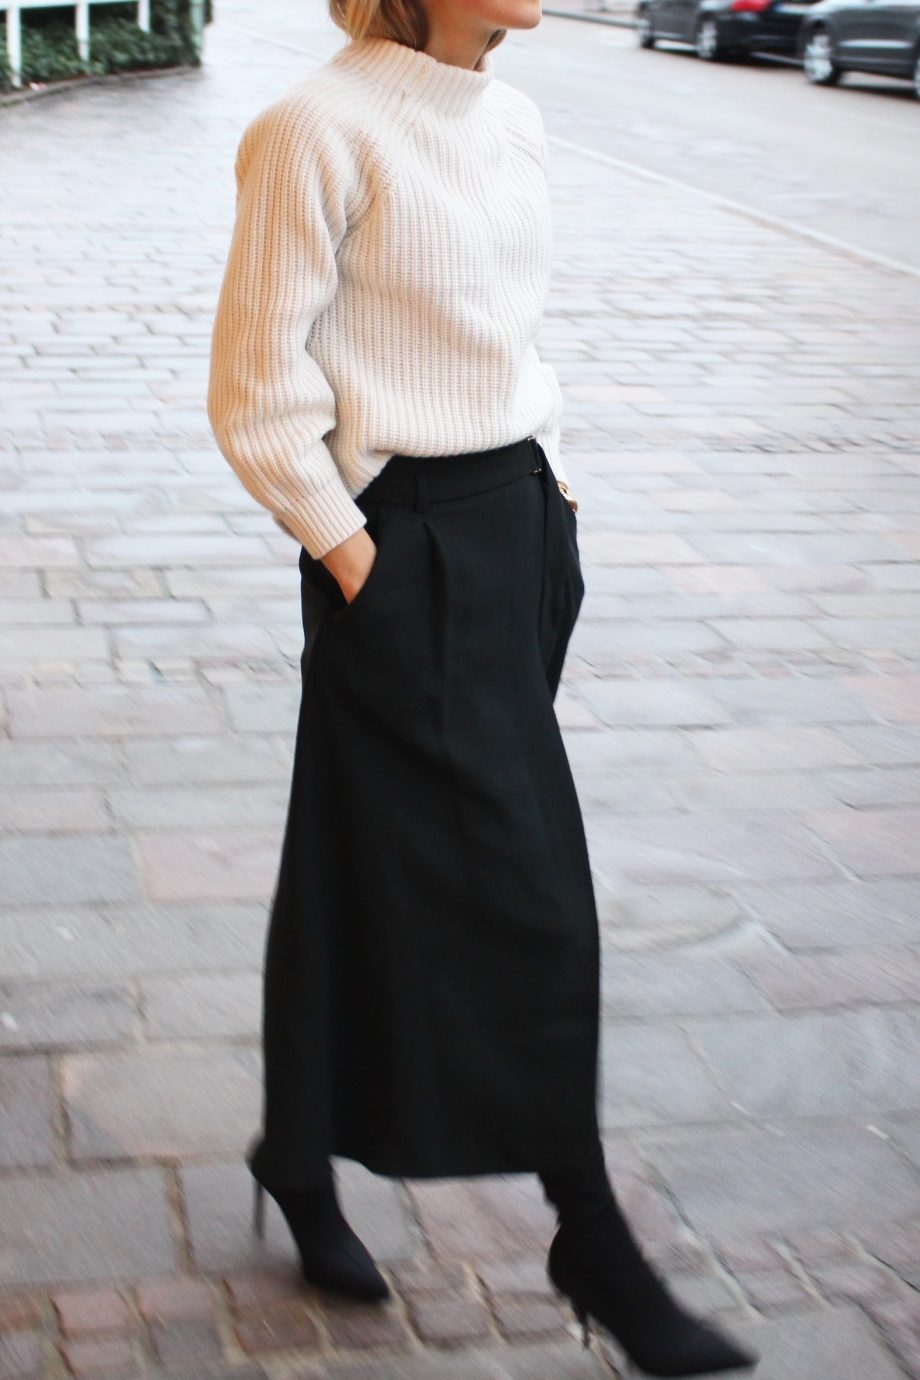 The Massimo Dutti Skirt |21.01.2018